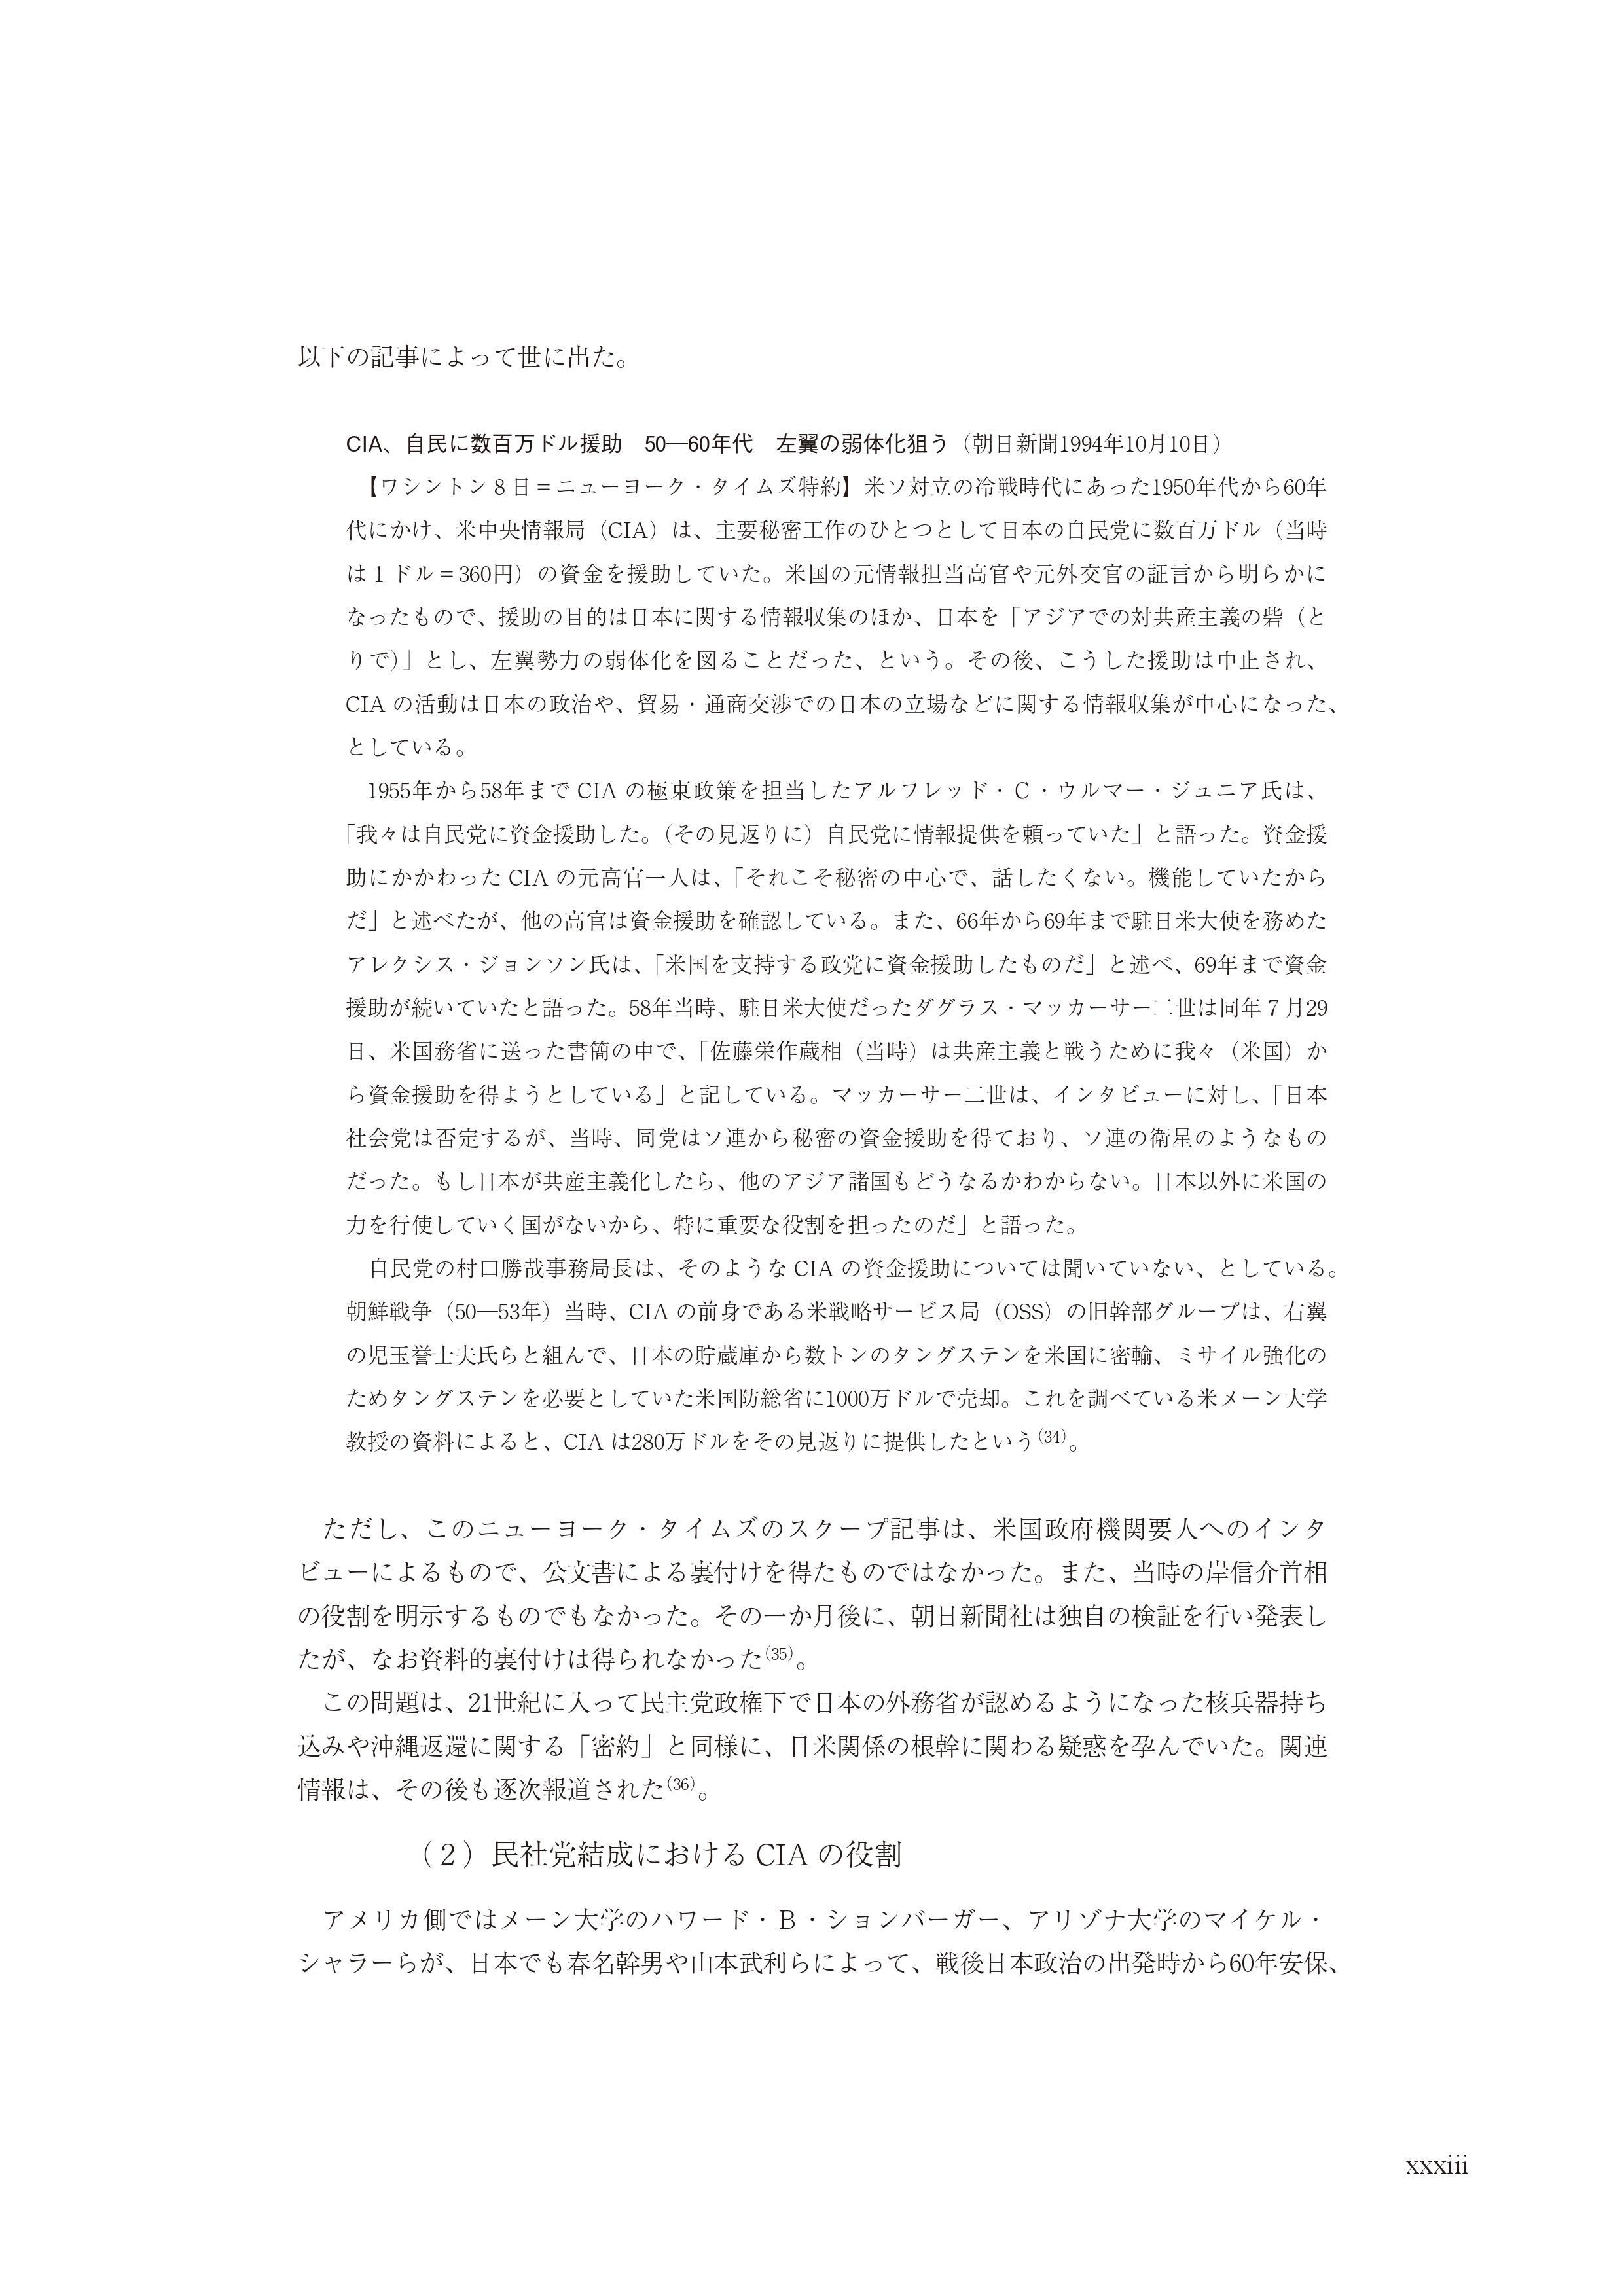 CIA日本人ファイル0001 (33)